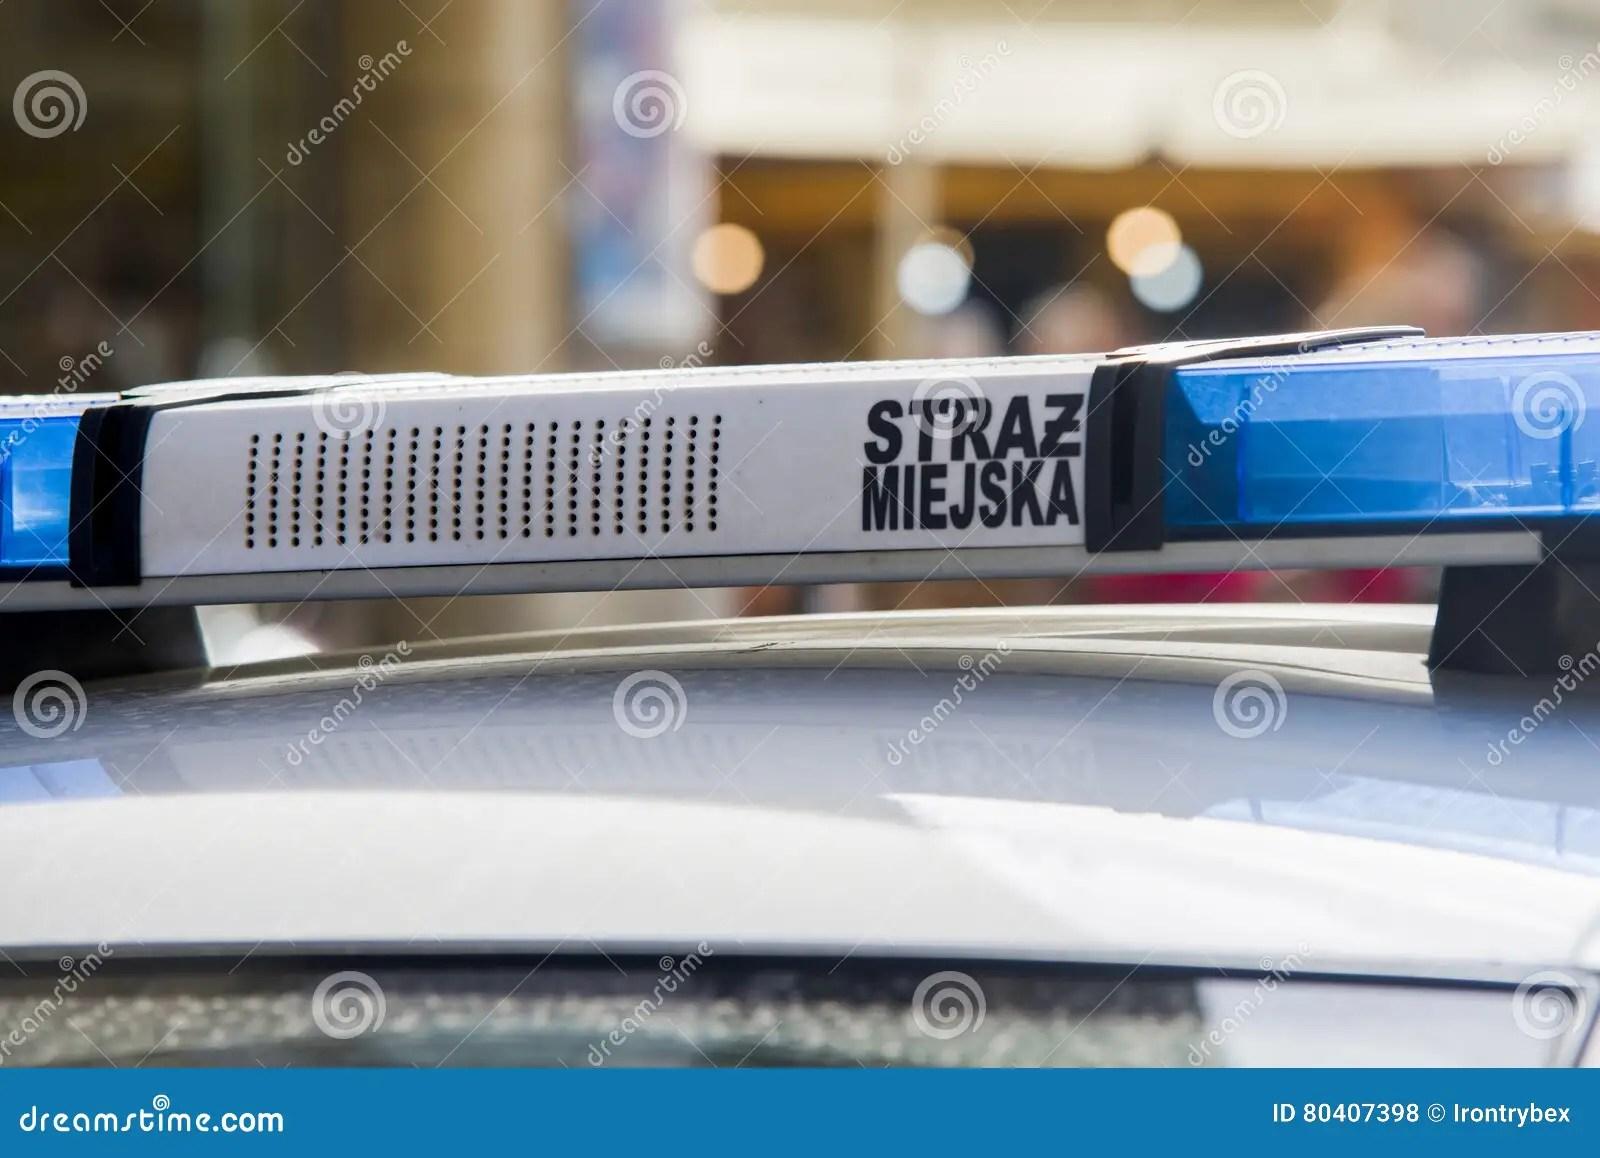 Close Up On Straz Miejska Municipal Police Sign On Car